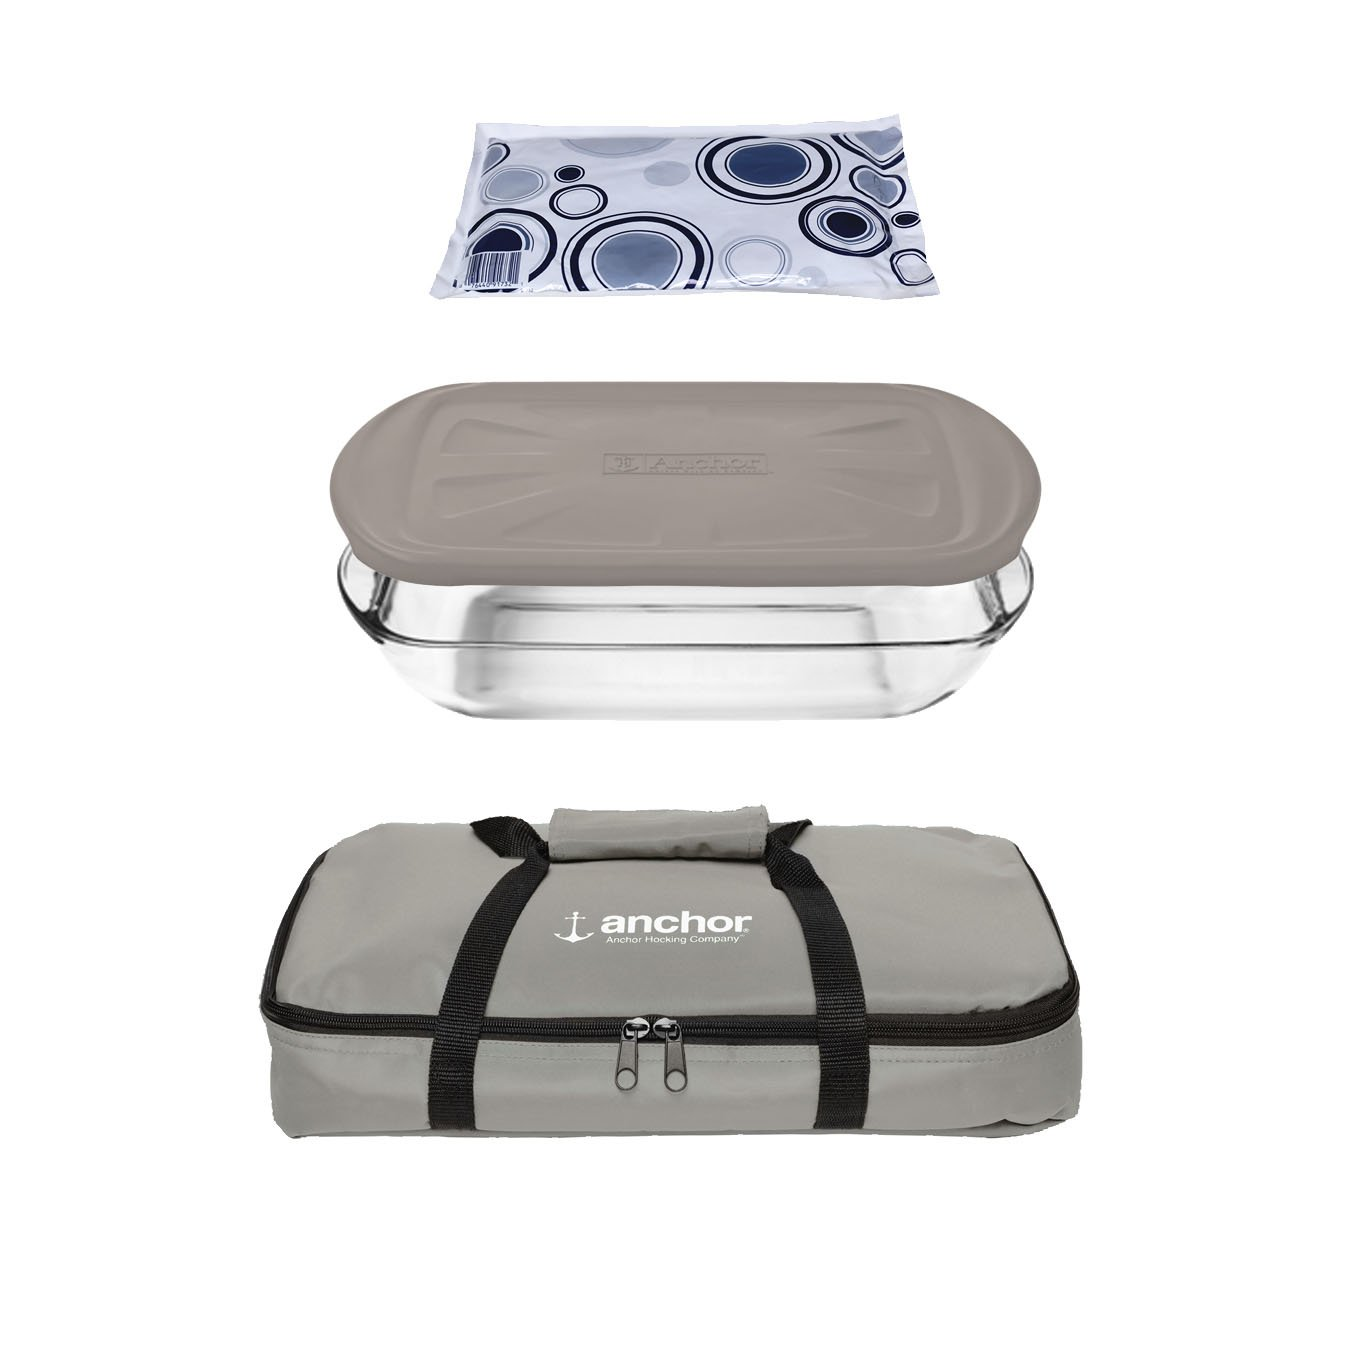 Anchor Hocking Oven Basics 4Piece Bake-N-Take Bakeware Set, Pepper Gray by Anchor Hocking (Image #1)